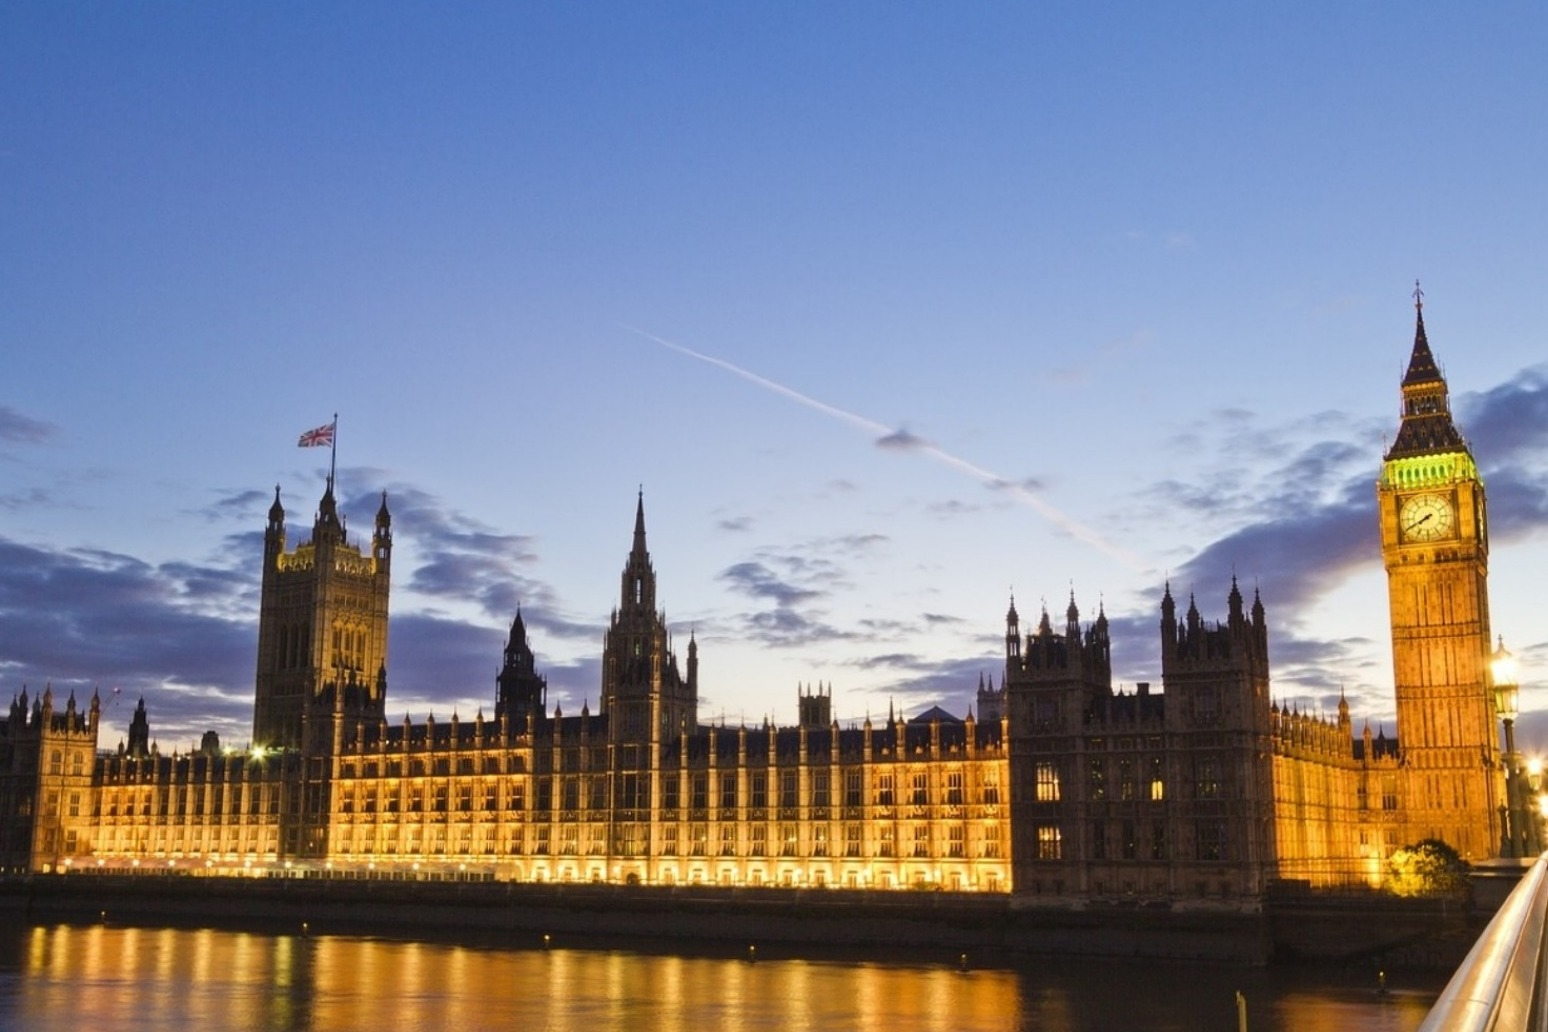 MPs vote against a no-deal Brexit